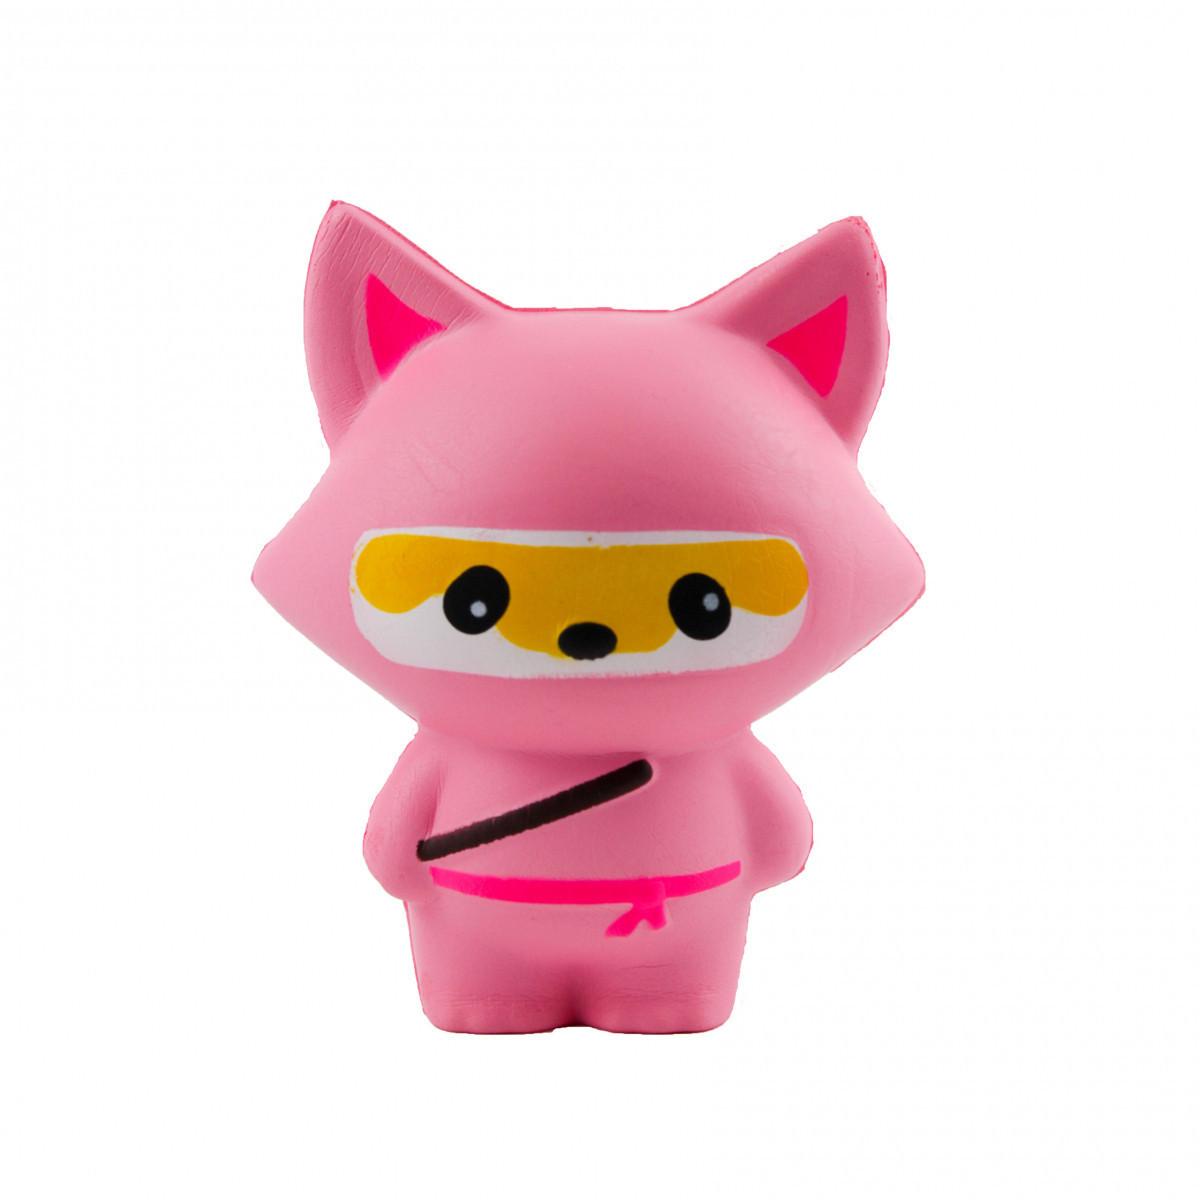 Сквиши SQUISHY Squishy Лиса нинзя большой Сквиш Антистресс игрушка